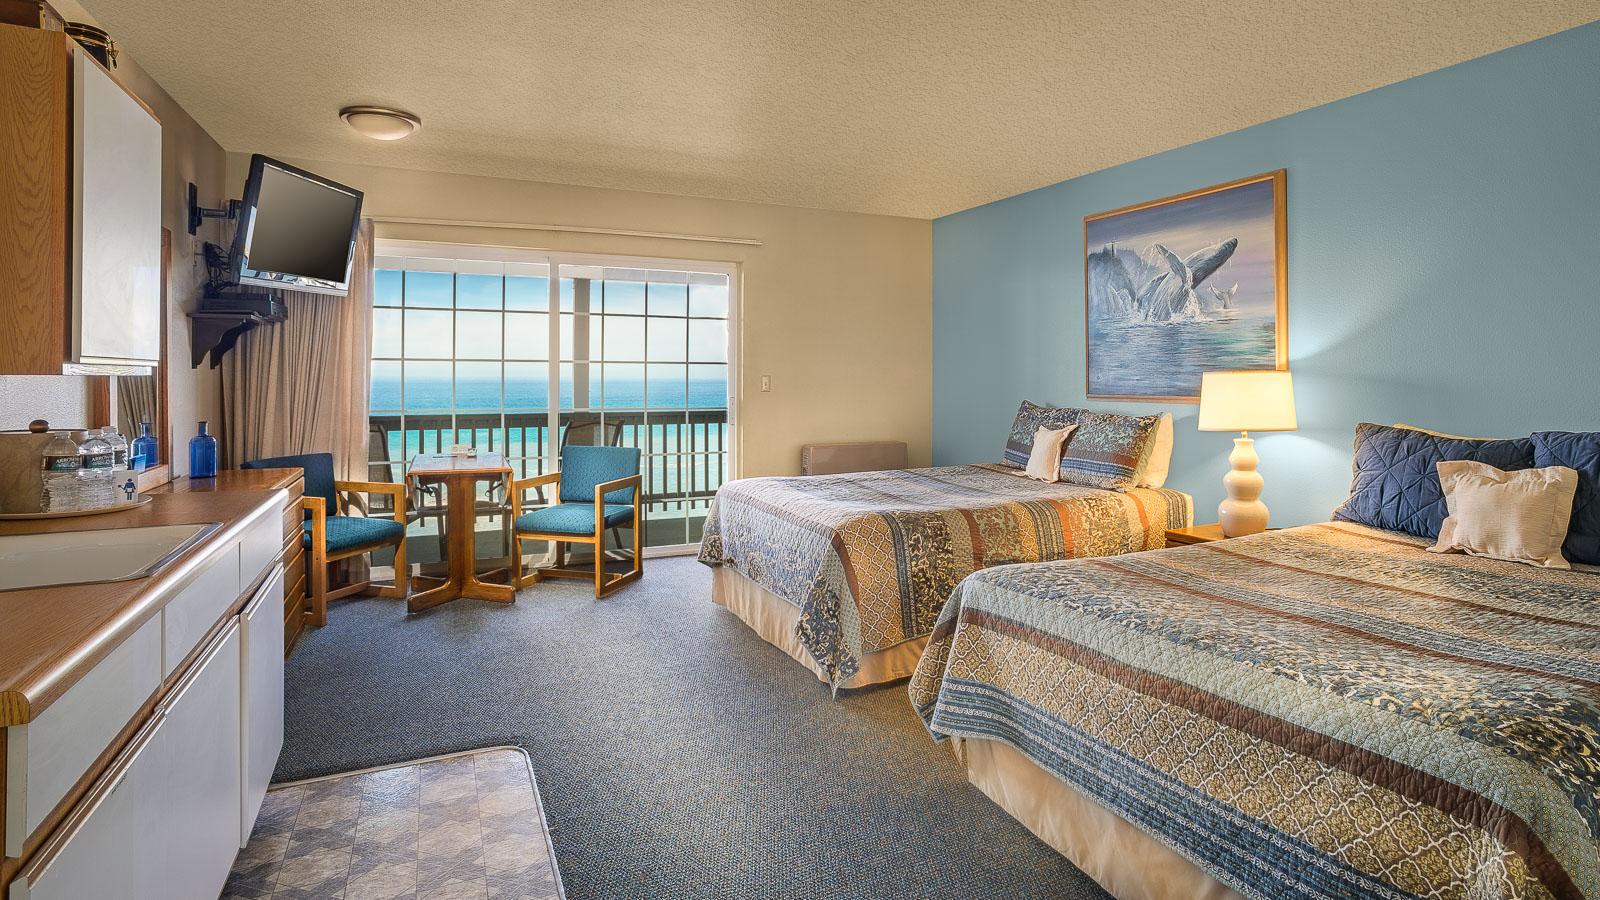 [object object] Rooms & Suites Standard Room Queen 1